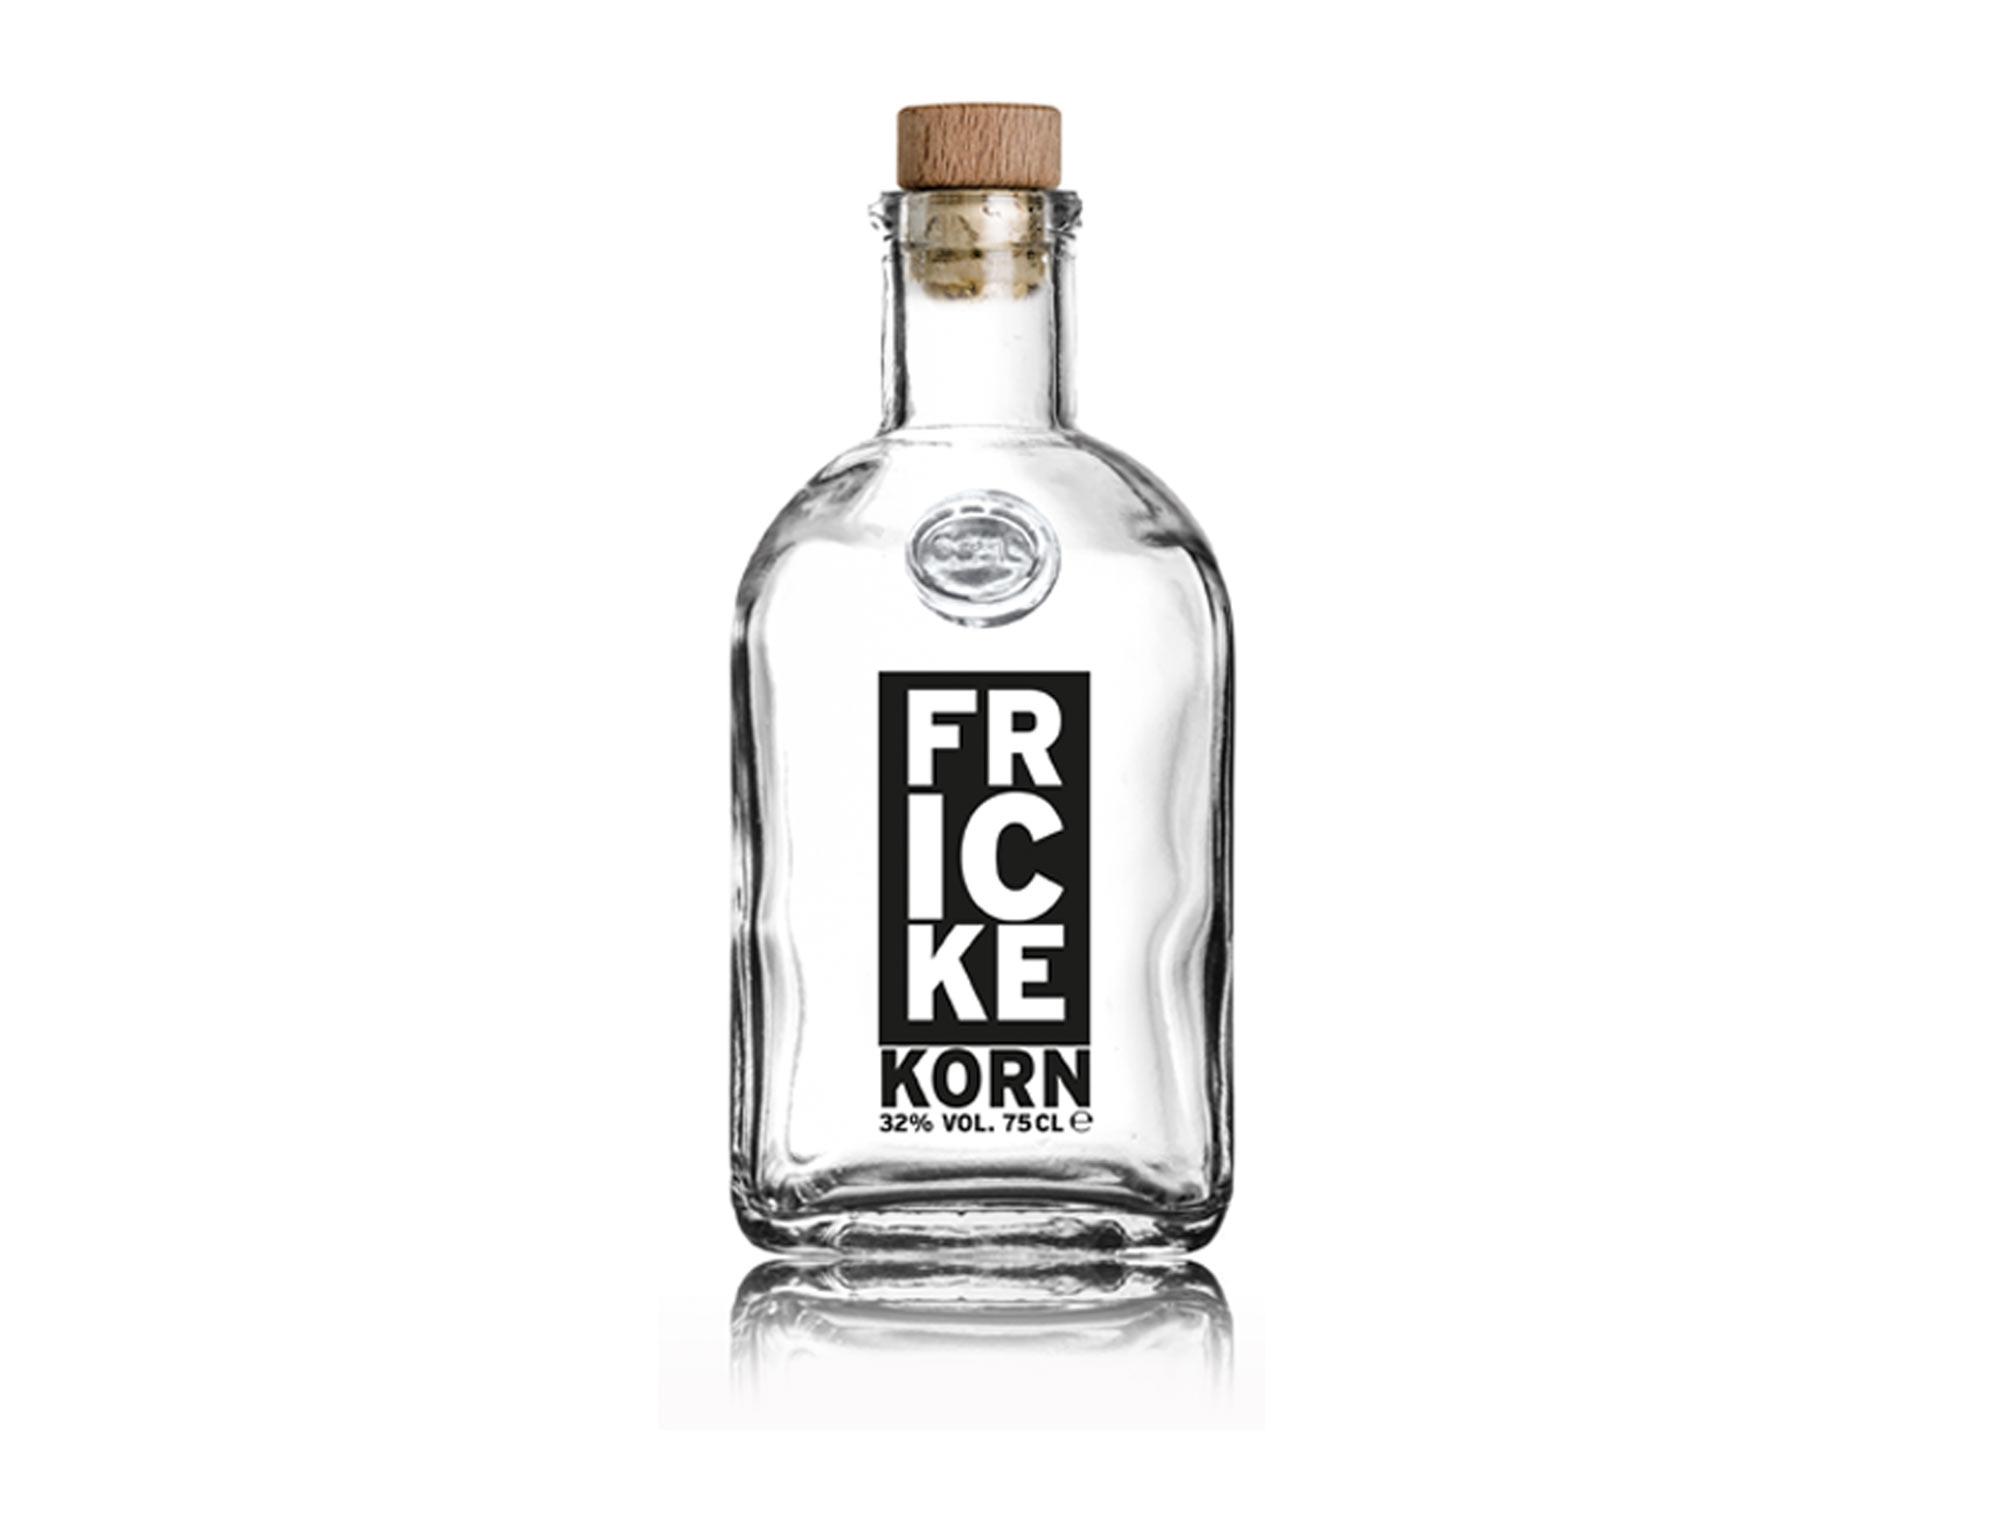 FRICKE Korn